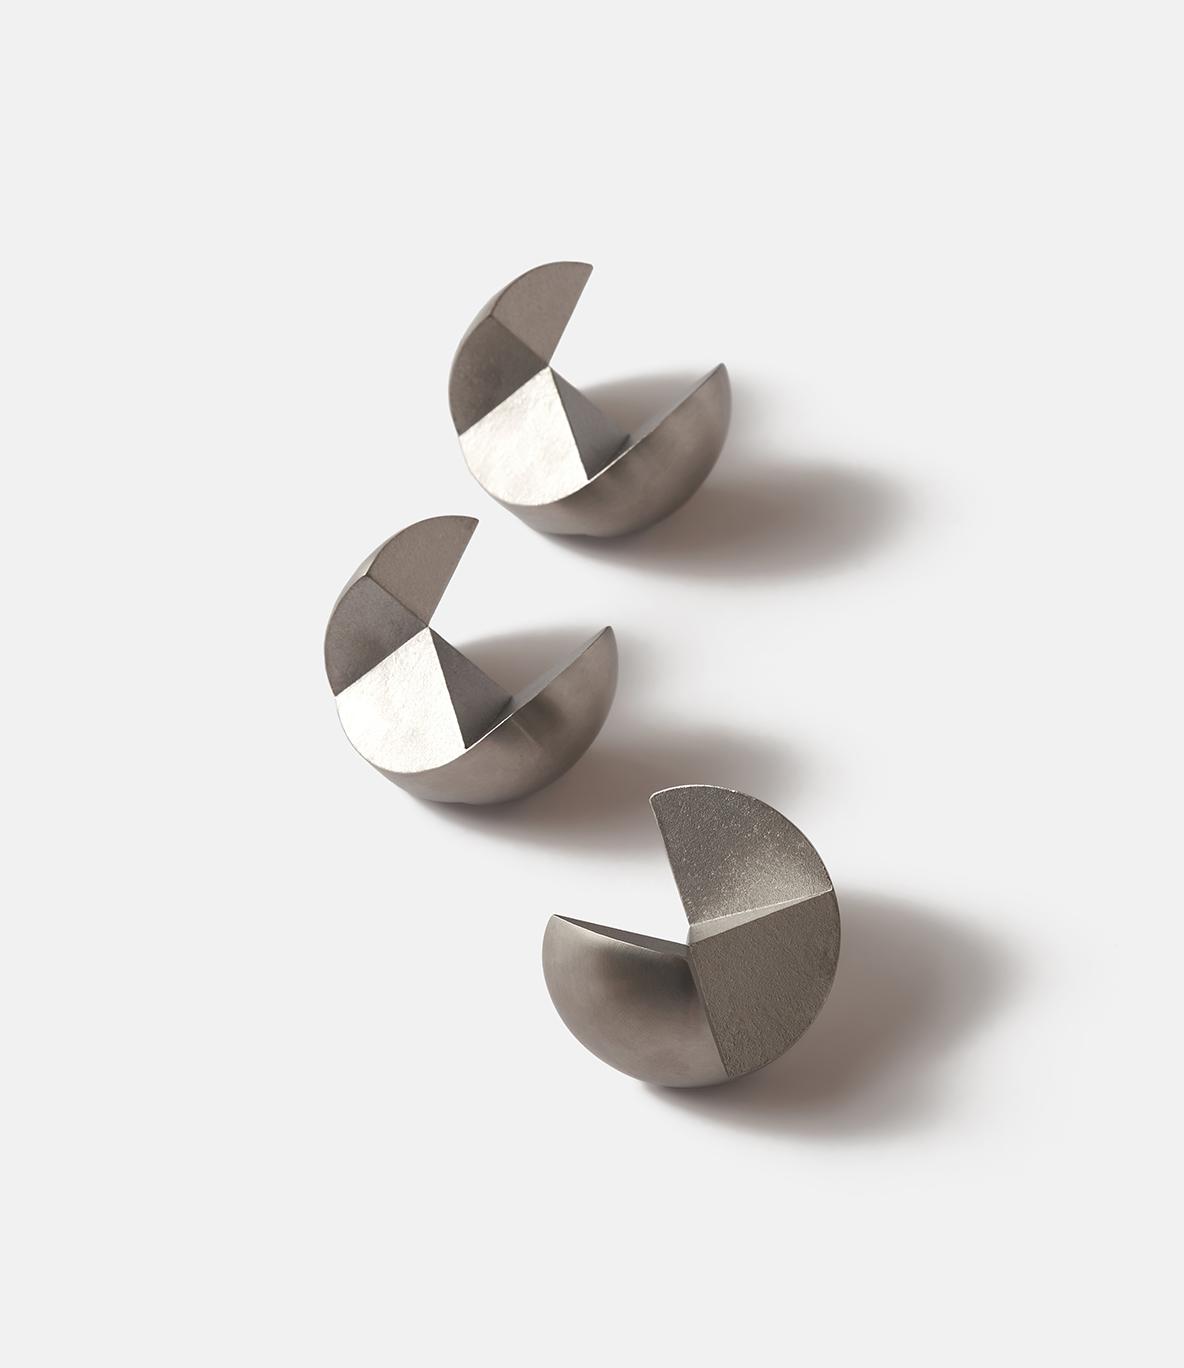 Craighill Venn Puzzle Steel — головоломка из стали